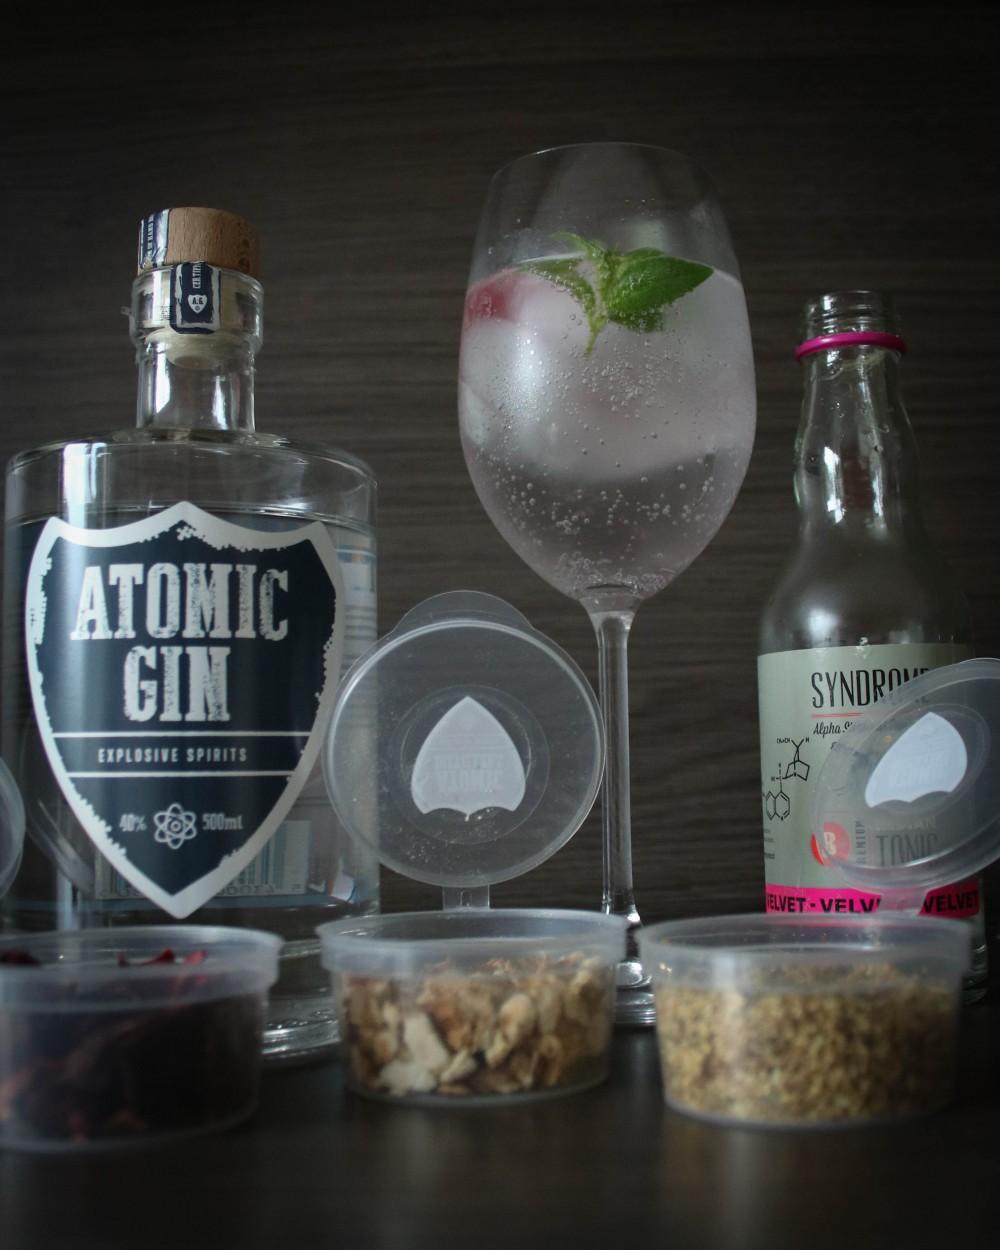 Belgian Gin tonic Recipe (Atomic Gin and Syndrome Tonic)